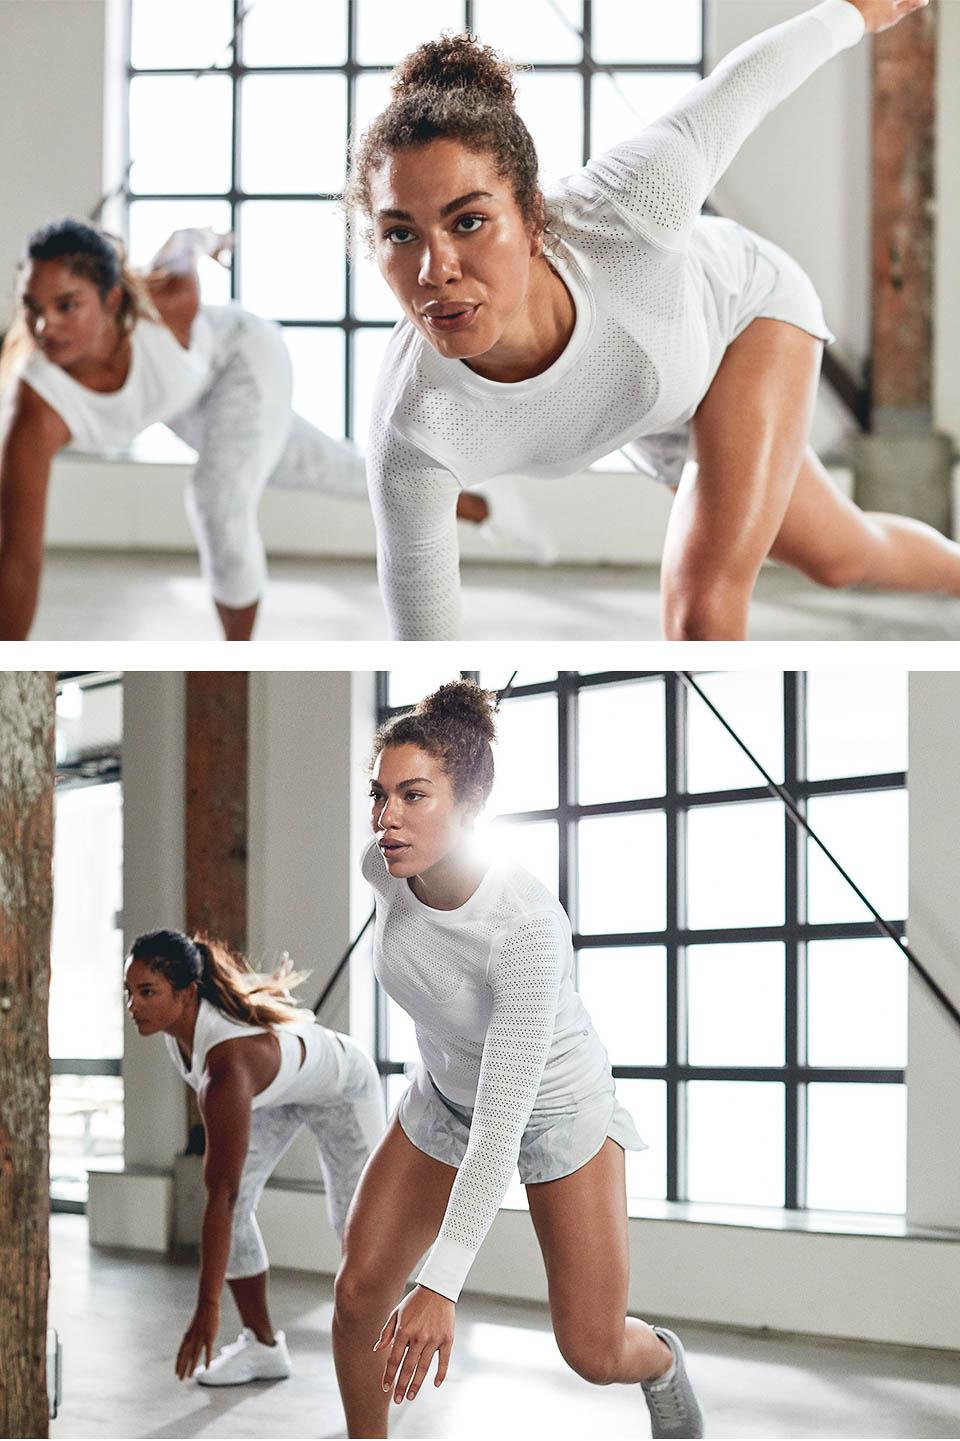 Mahina-Garcia-Catrina-Judge-Training-Workout-Vancouver-Canada-photoshoot-lululemon-athletica-Matt-Korinek-Photographer-960px-1.jpg